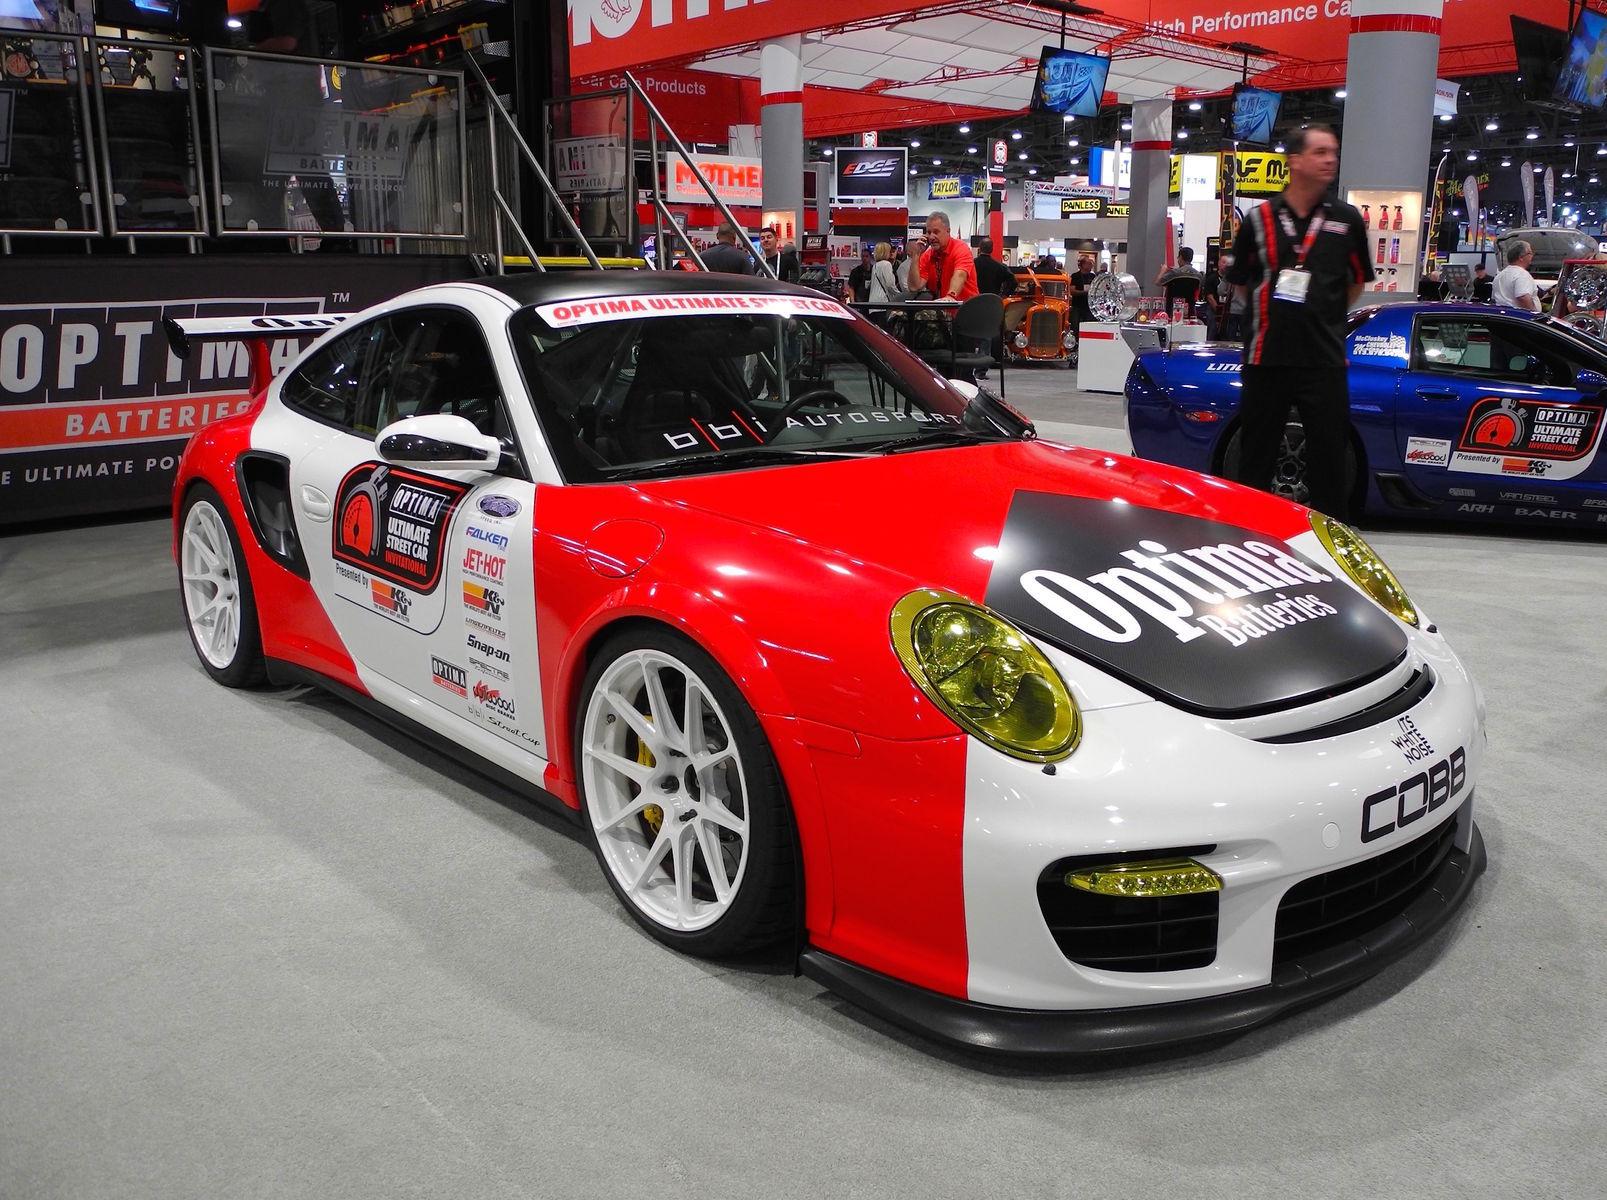 2008 Porsche 911 | BBi Autosport's 997.1 Porsche 911 Turbo on Forgeline 1pc Forged Monoblock GA1R Open Lug Wheels